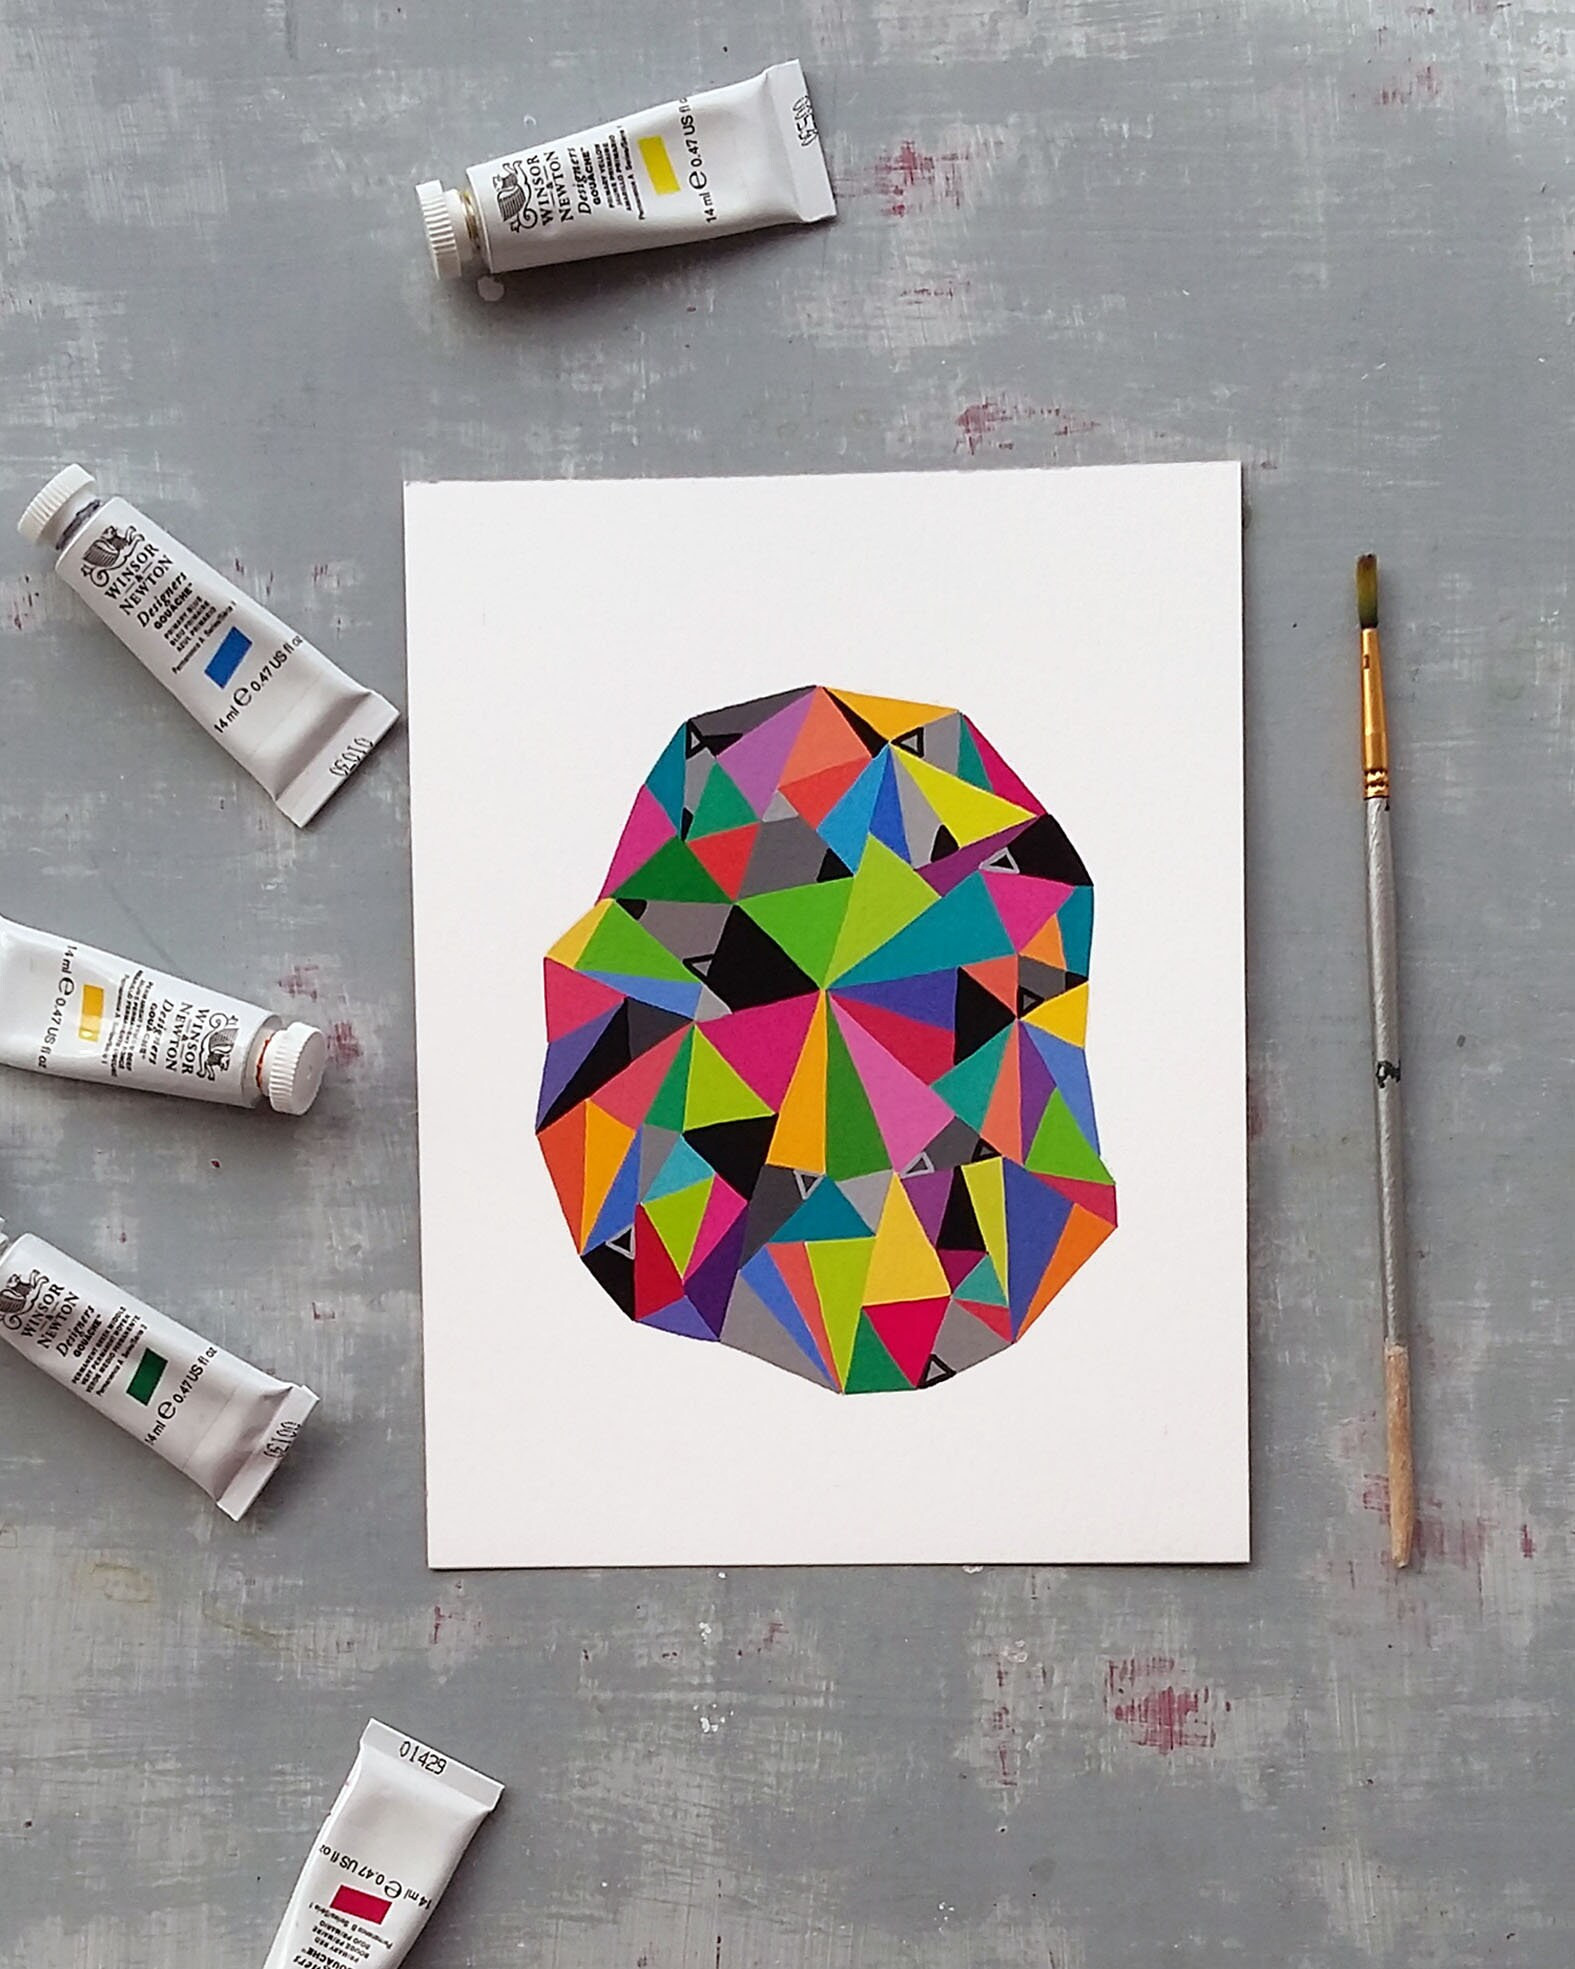 Shape_002, original geometric painting on paper - product image